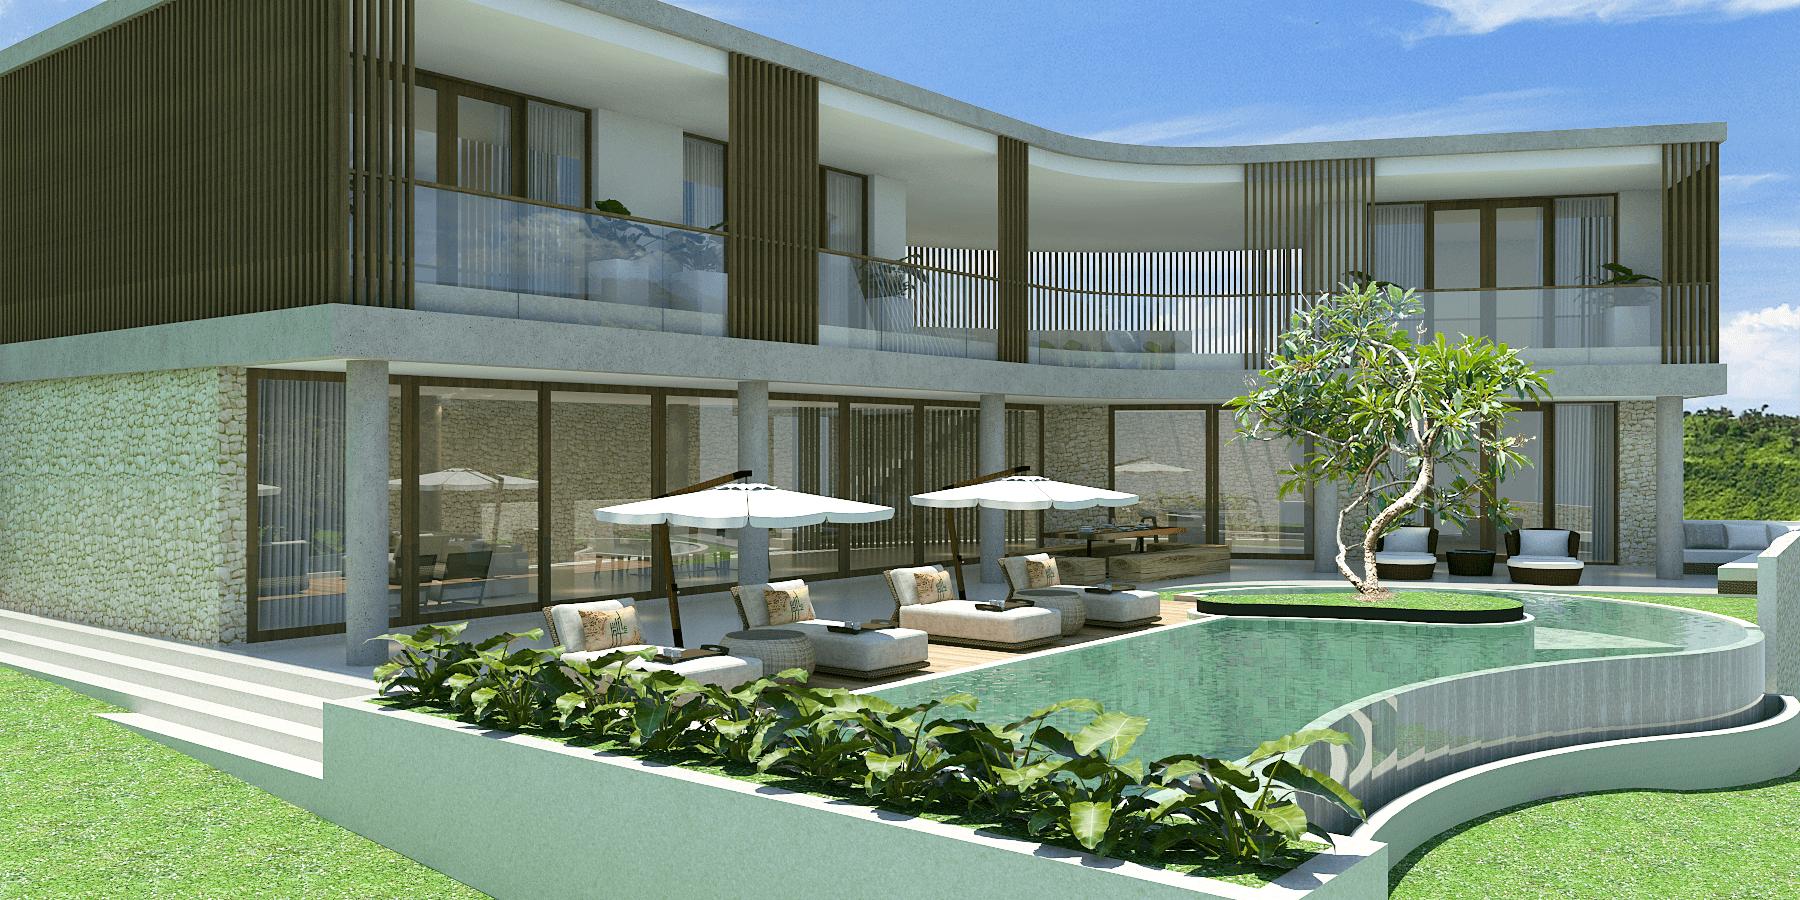 Pt. Indodesign Kreasi Mandiri Lombok Hotel South Lombok Kuta South Lombok Kuta Swimming Pool Area  <P>Villa 4Brm</p> 16094